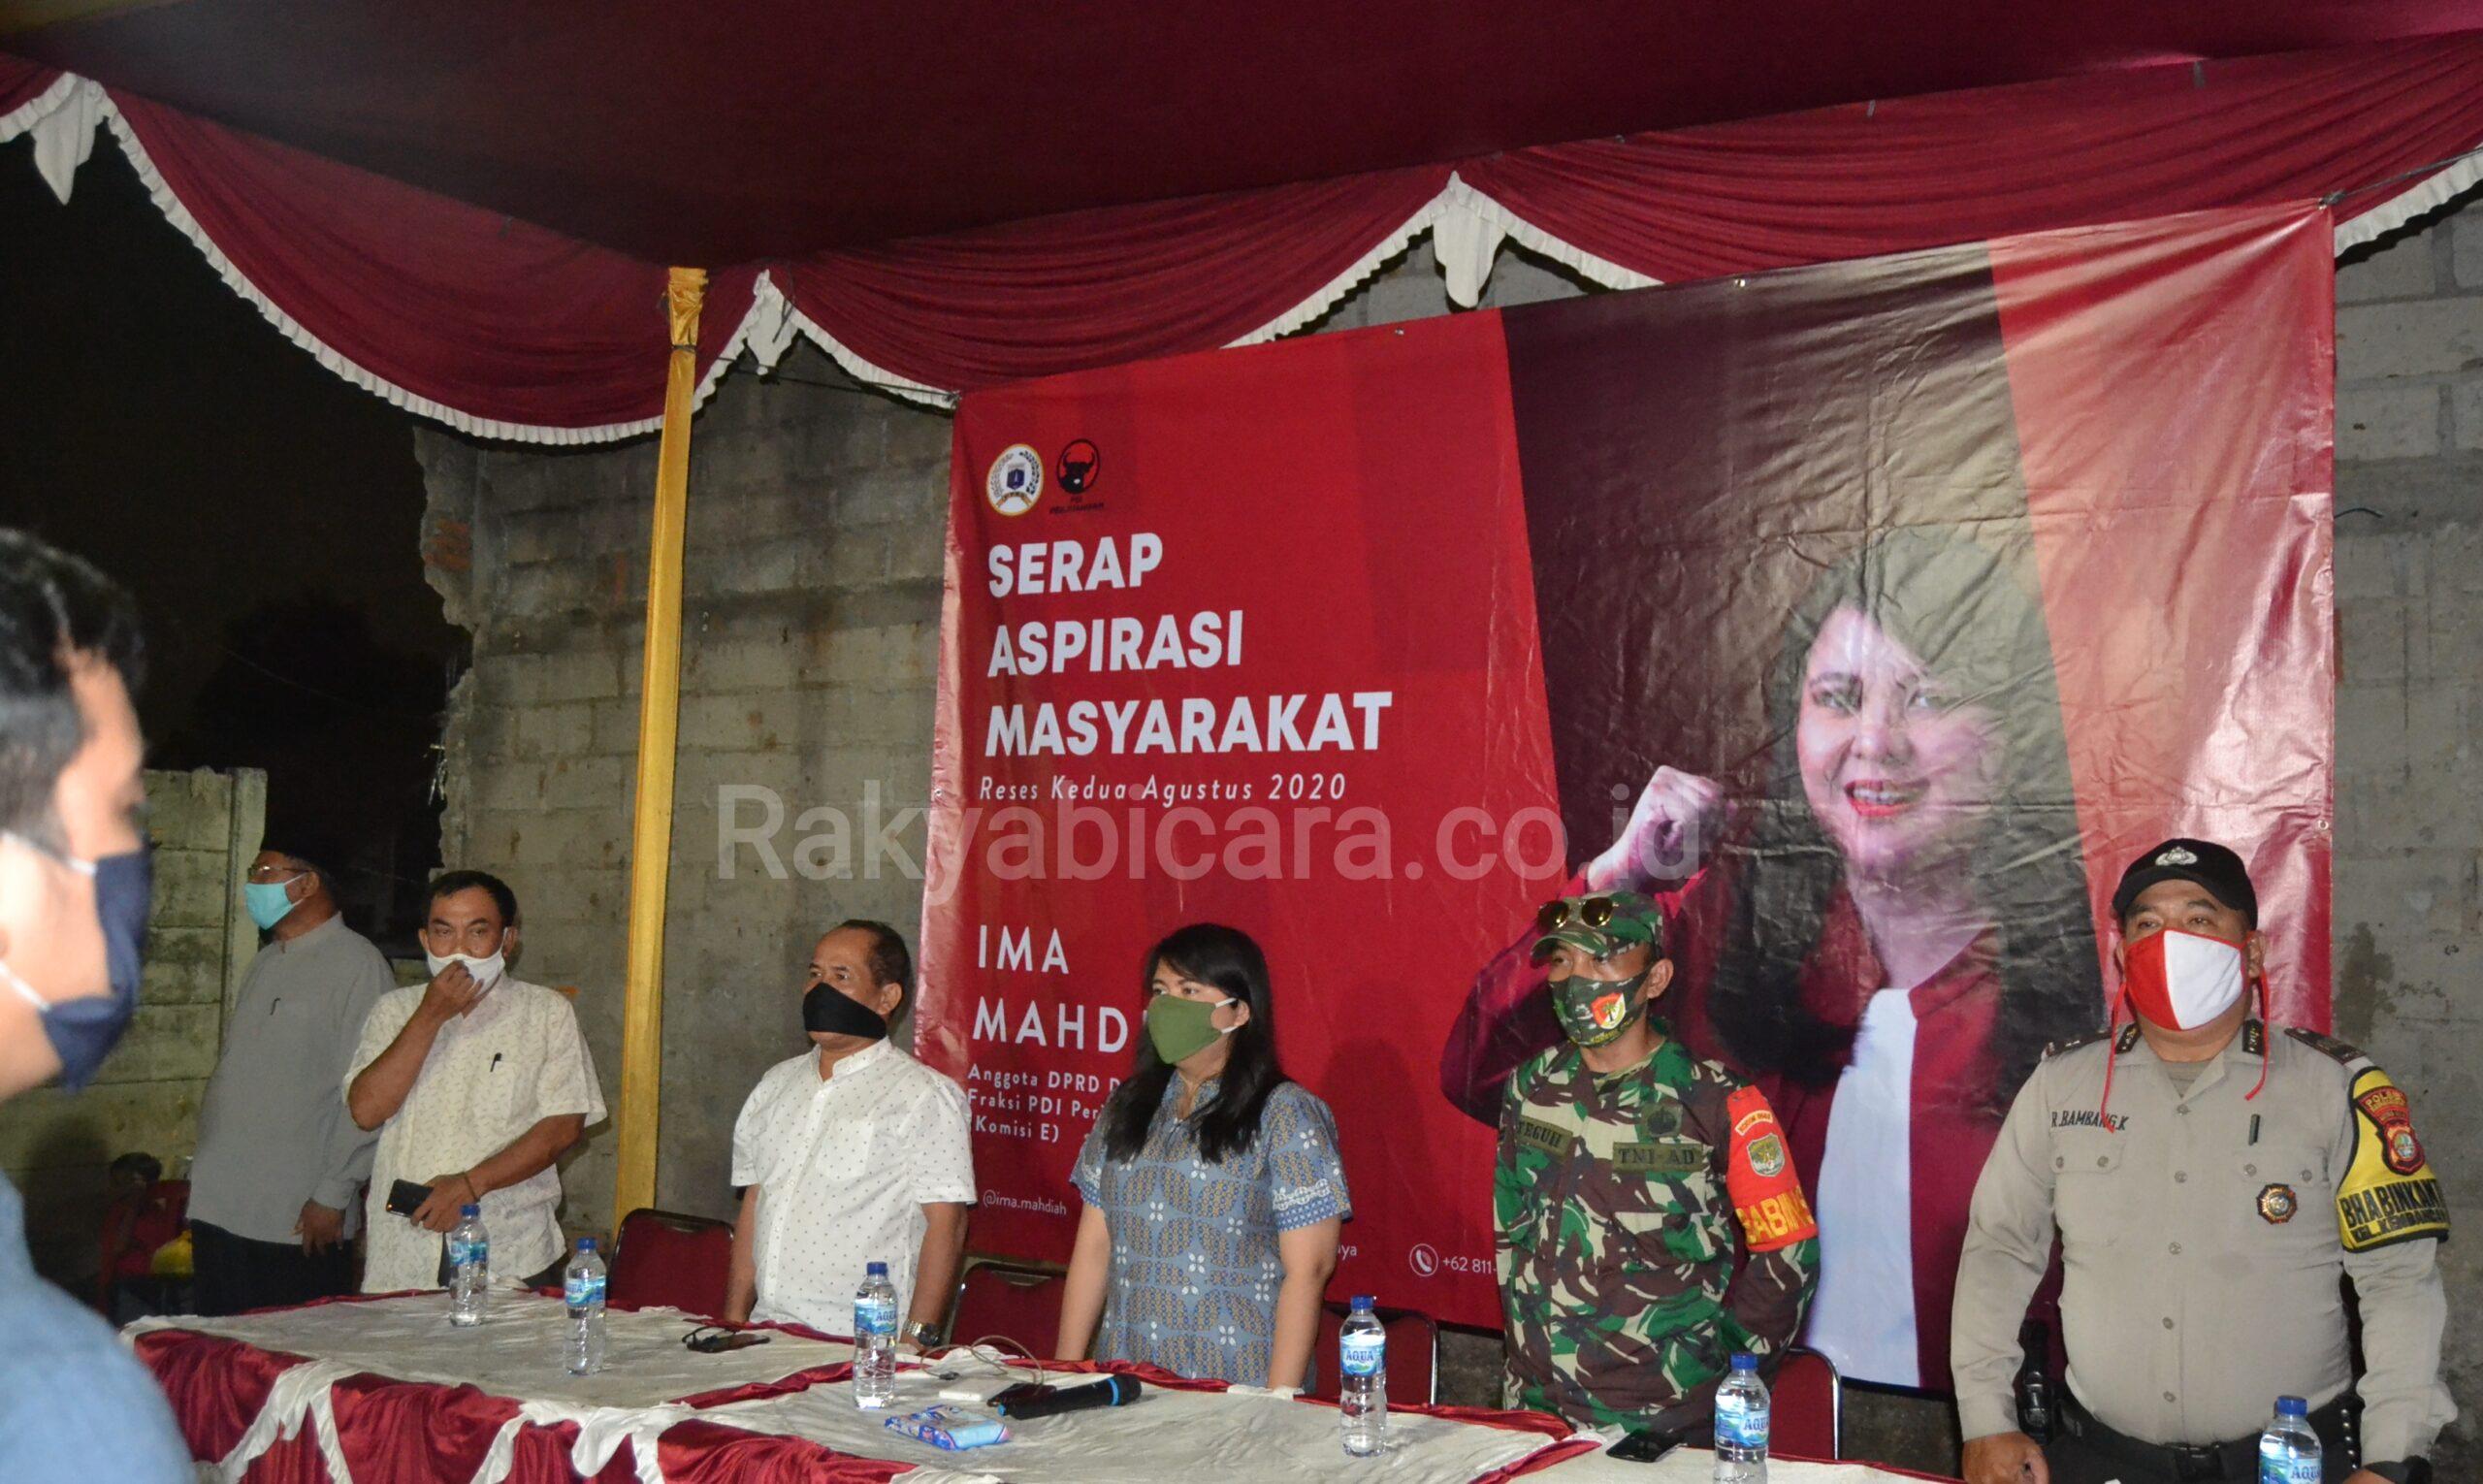 Reses Ke 2 Anggota DPRD Provinsi DKI Jakarta, Ima Mahdiah Kunjungi Kembangan Selatan